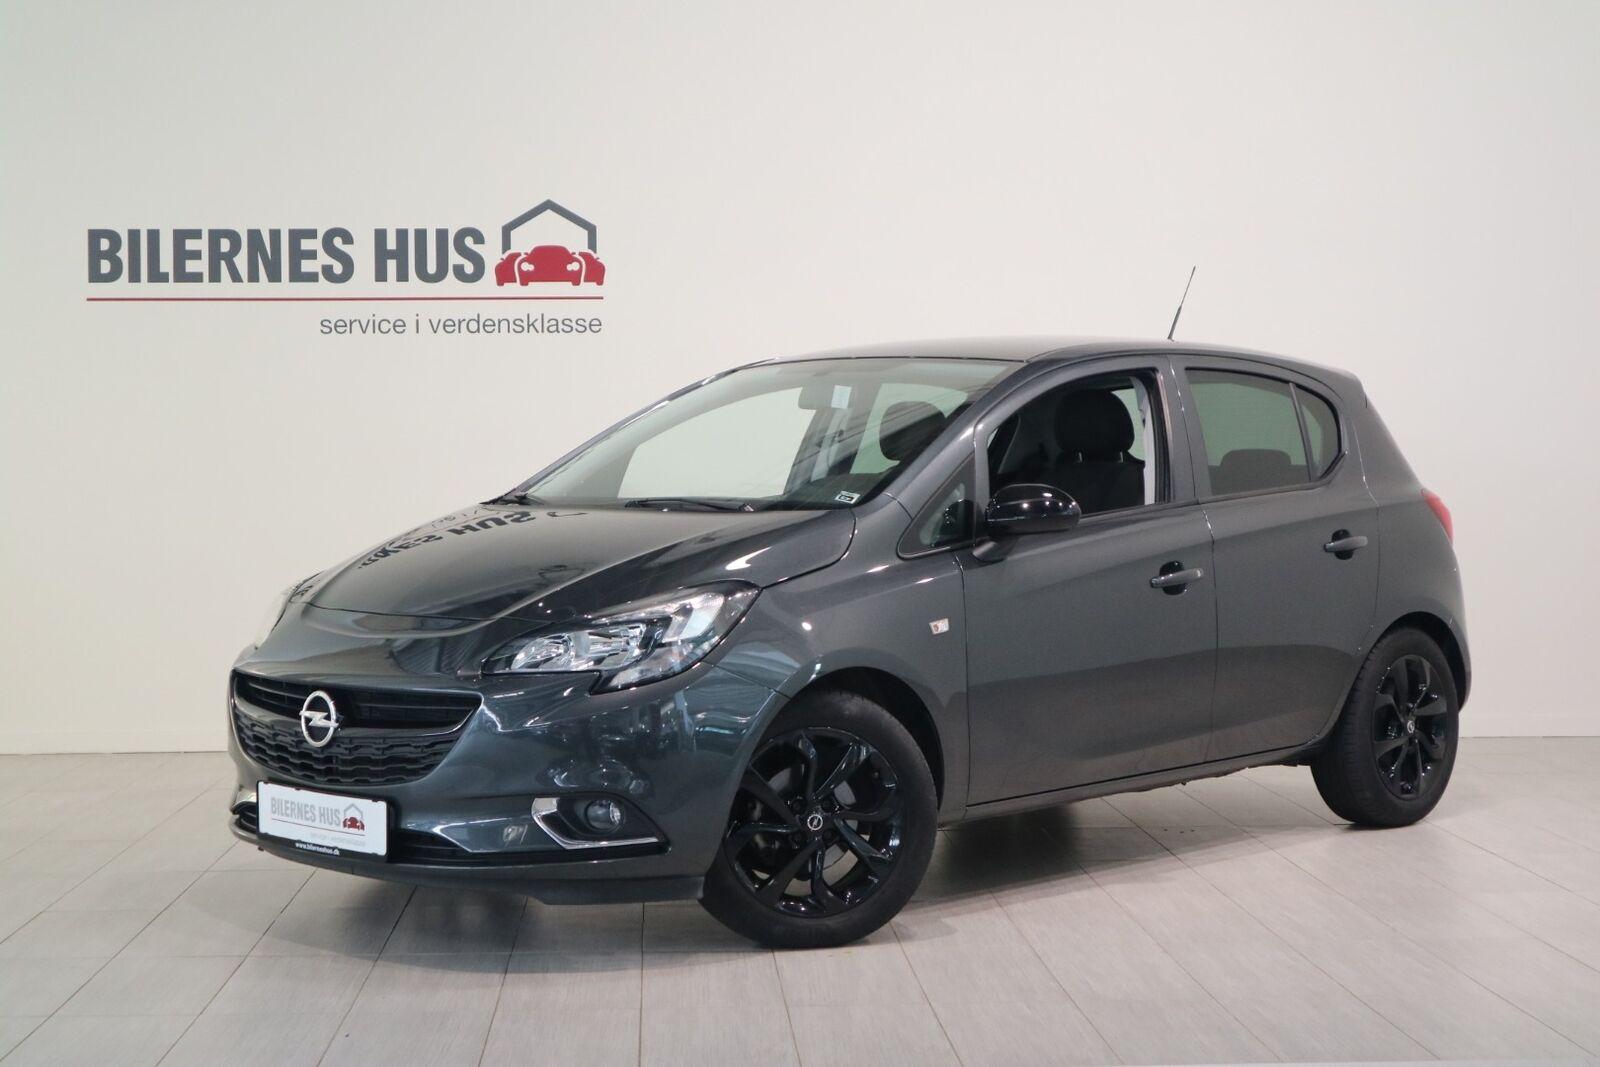 Opel Corsa Billede 3